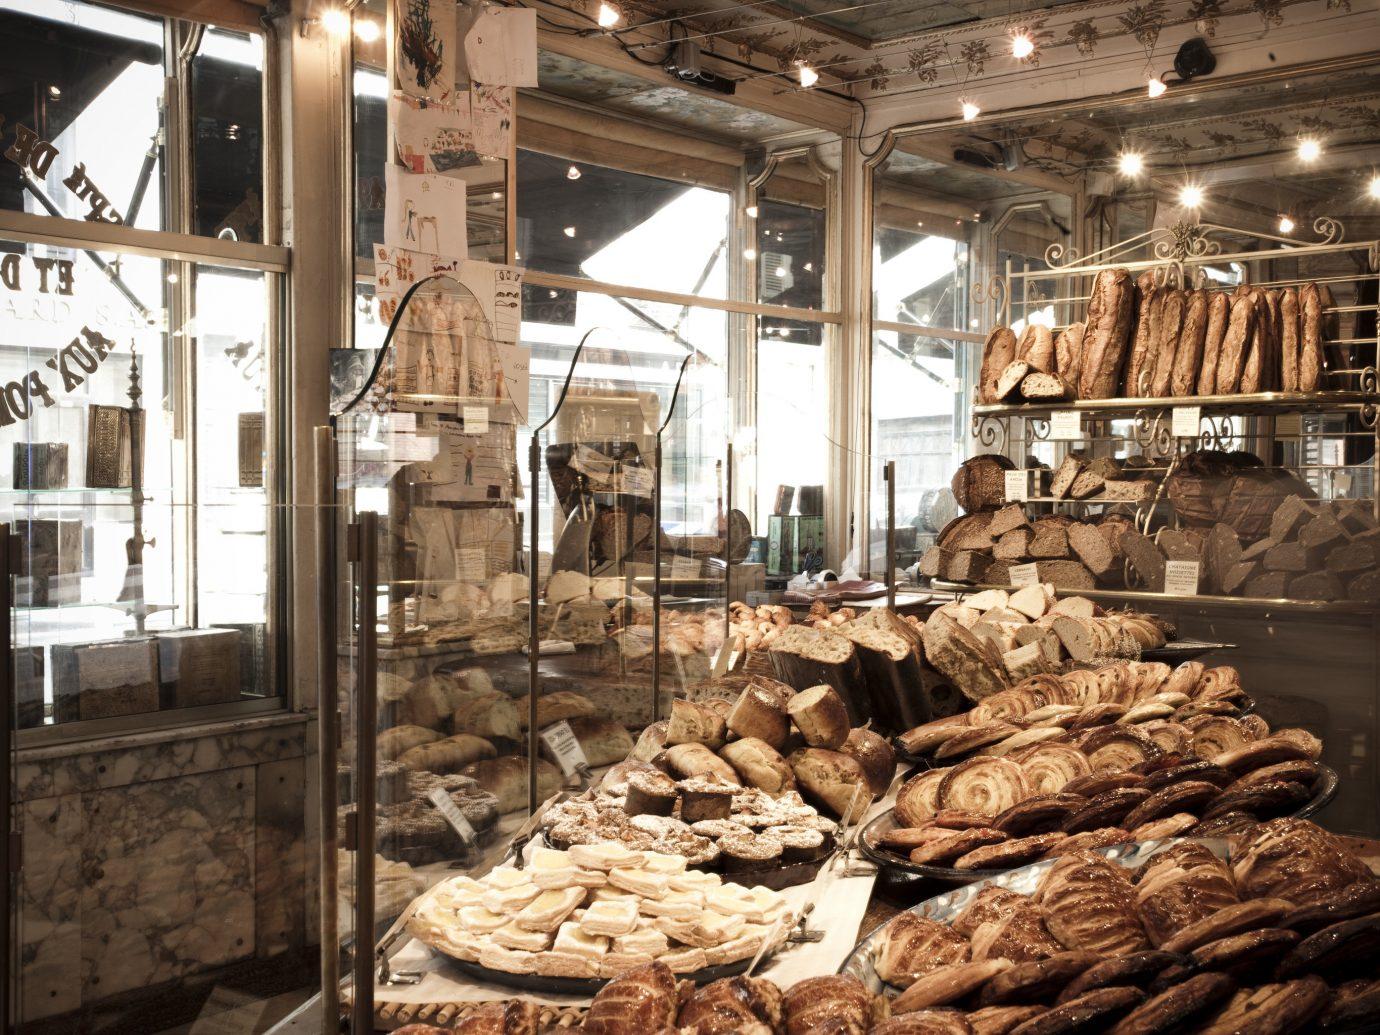 Food + Drink France Paris indoor pastry bakery building case wood food market stall store Shop baked sale several